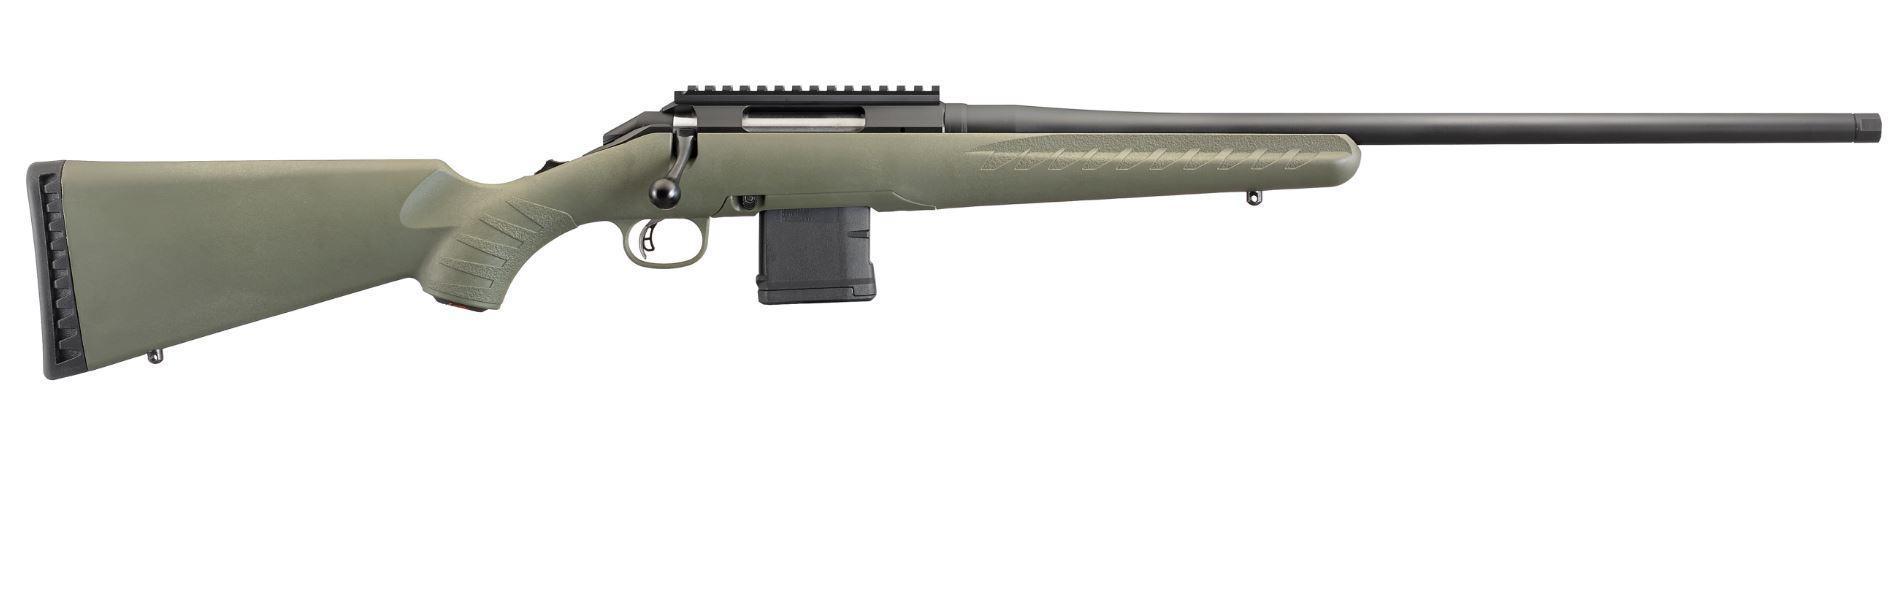 Ruger Predator American-img-0